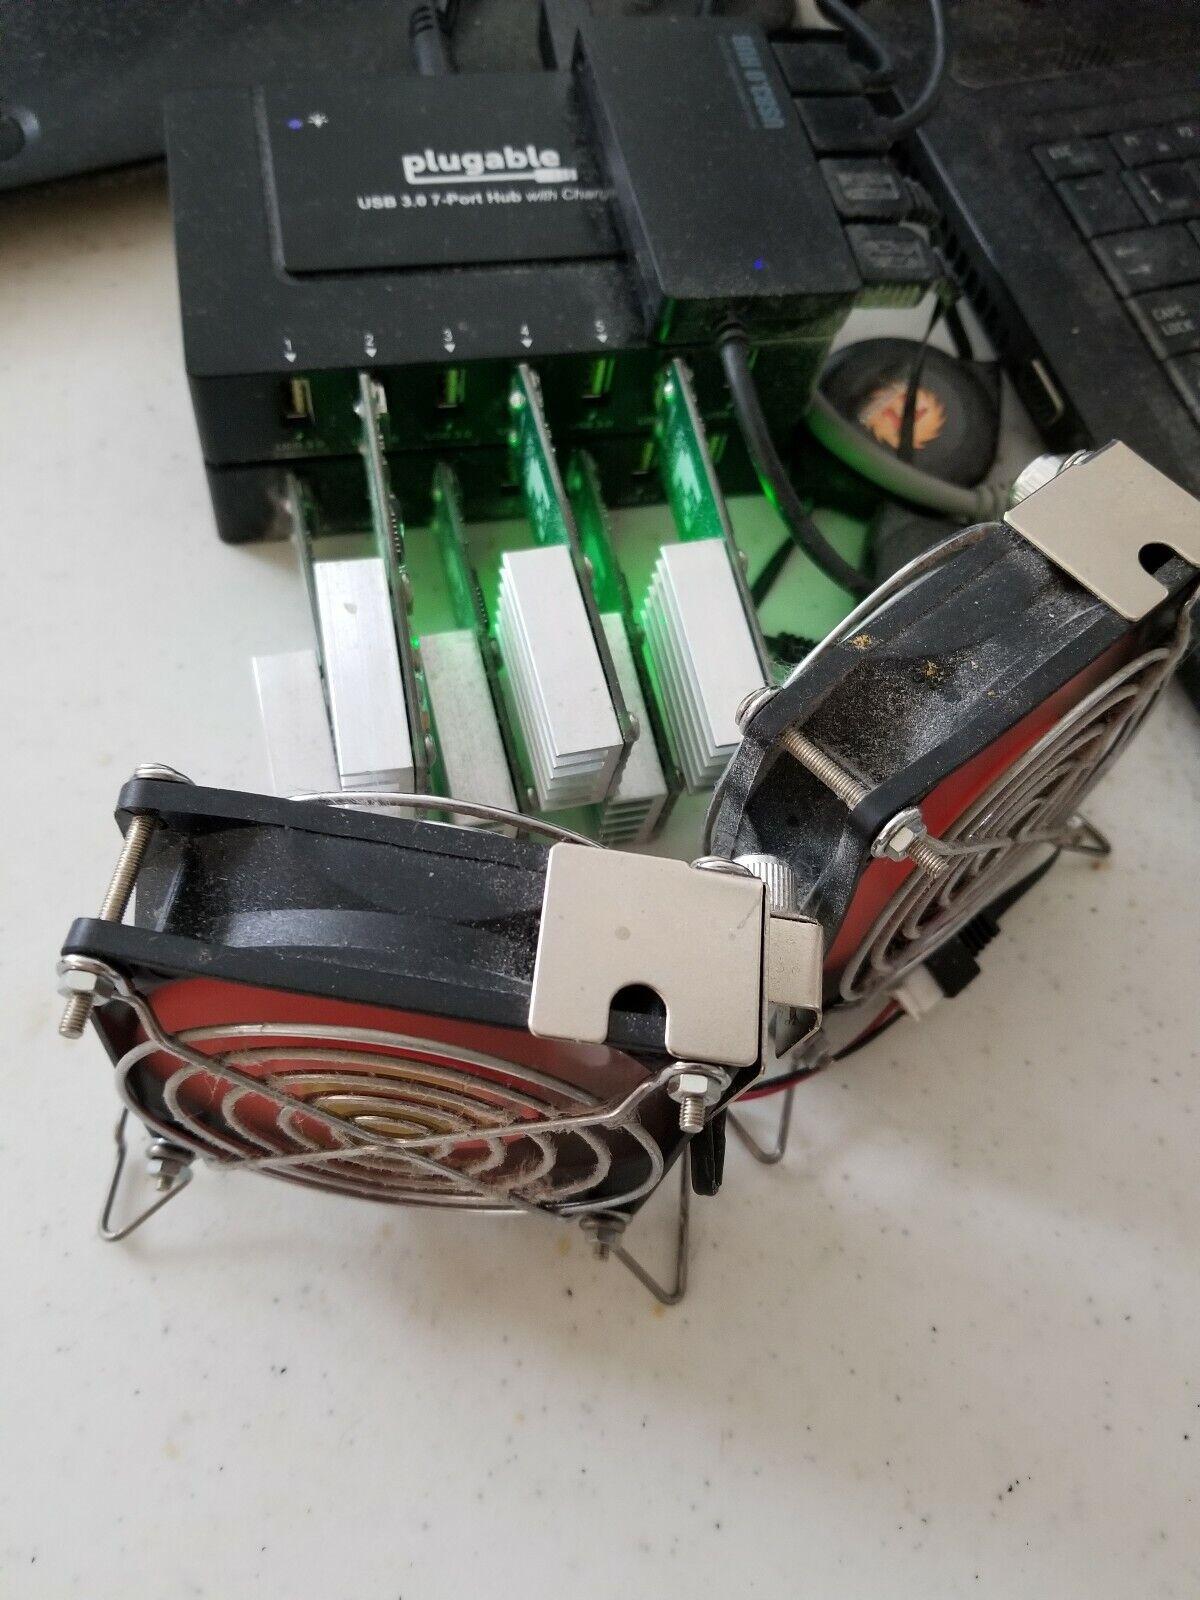 GekkoScience NEWPAC BM1387 SHA256 Bitcoin | 6 USB Mining Setup - Barely Used 1